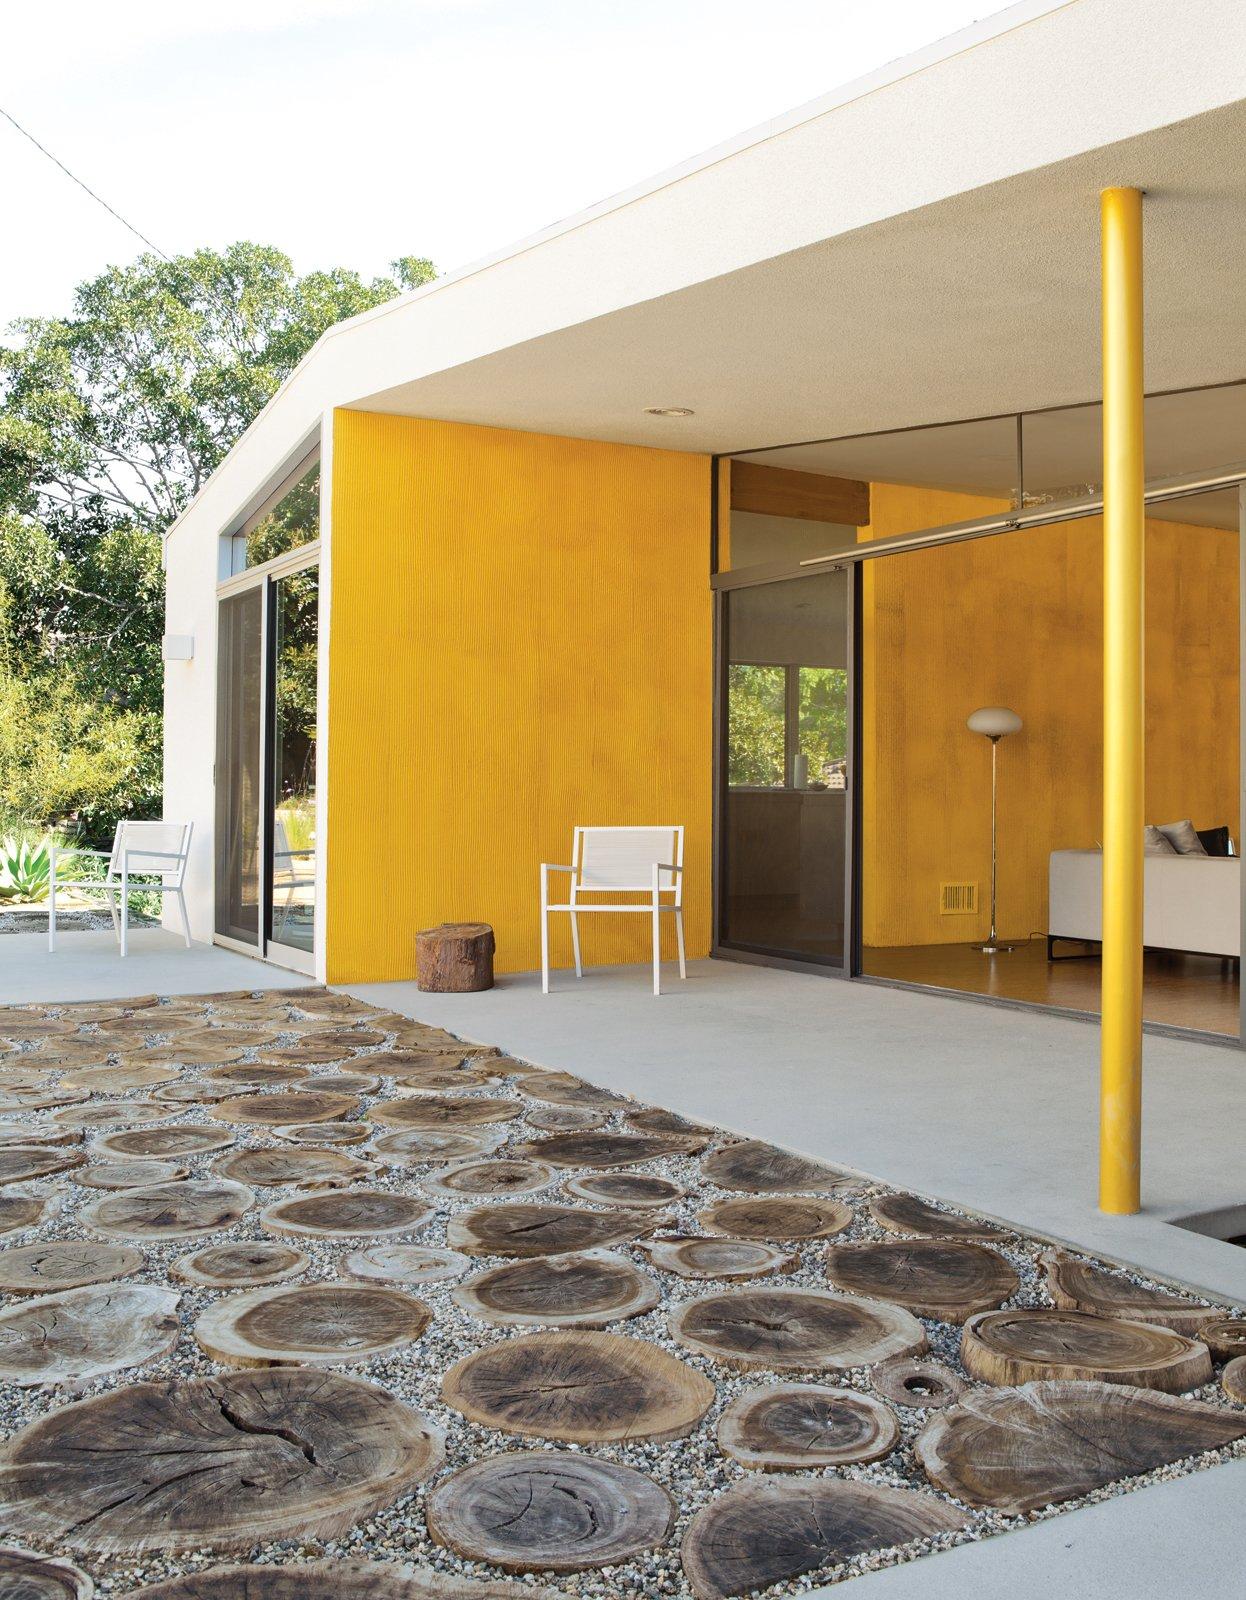 #color #yellow #minimal #backyard #patio #coveredpatio #exterior #outdoor #openair #renovation #LosAngeles #California #TaalmanKoch   36+ Interior Color Pop Ideas For Modern Homes